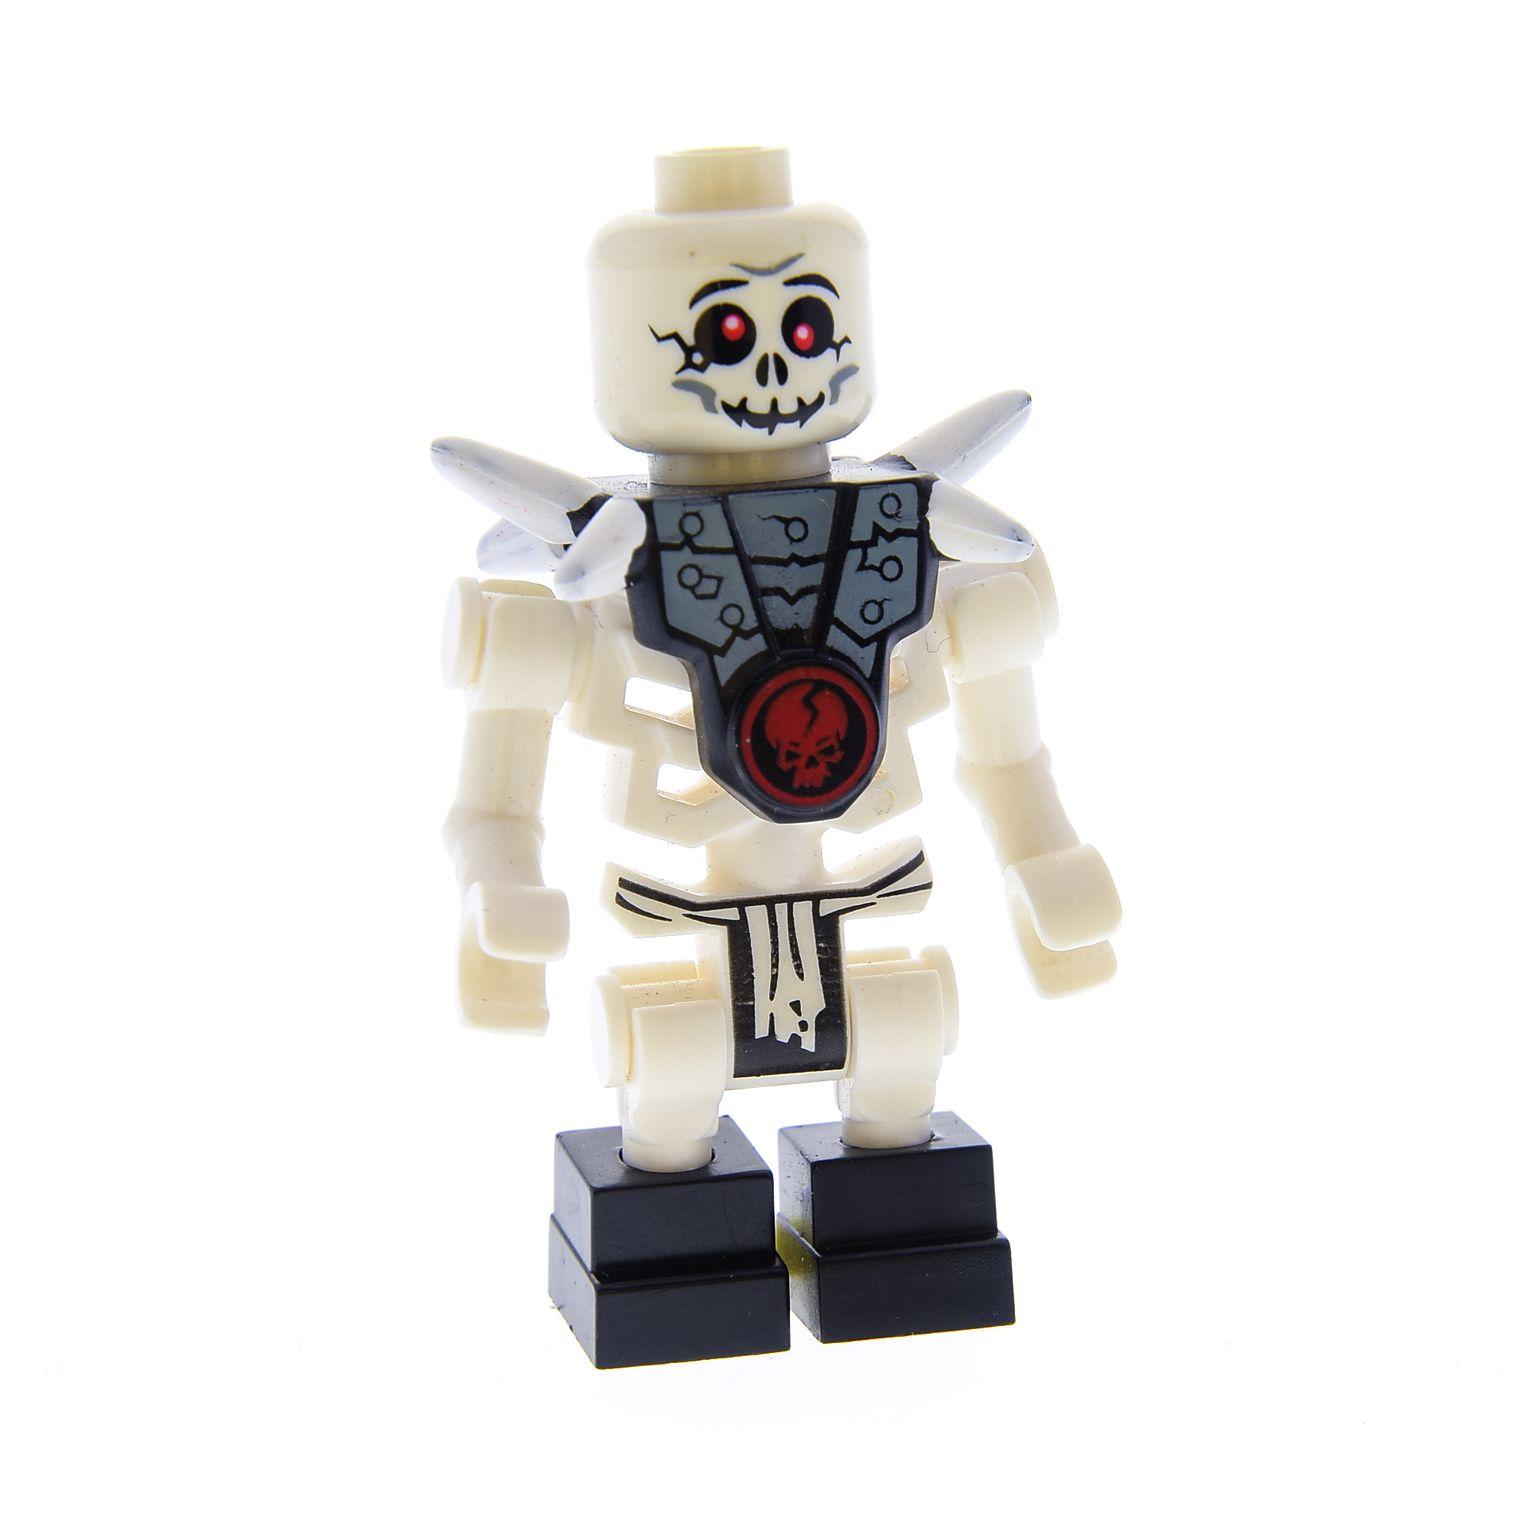 Lego 4 x Skelett Fuß Bein 93062c01 schwarz weiß Ninjago Krazi Bonezai Chopov